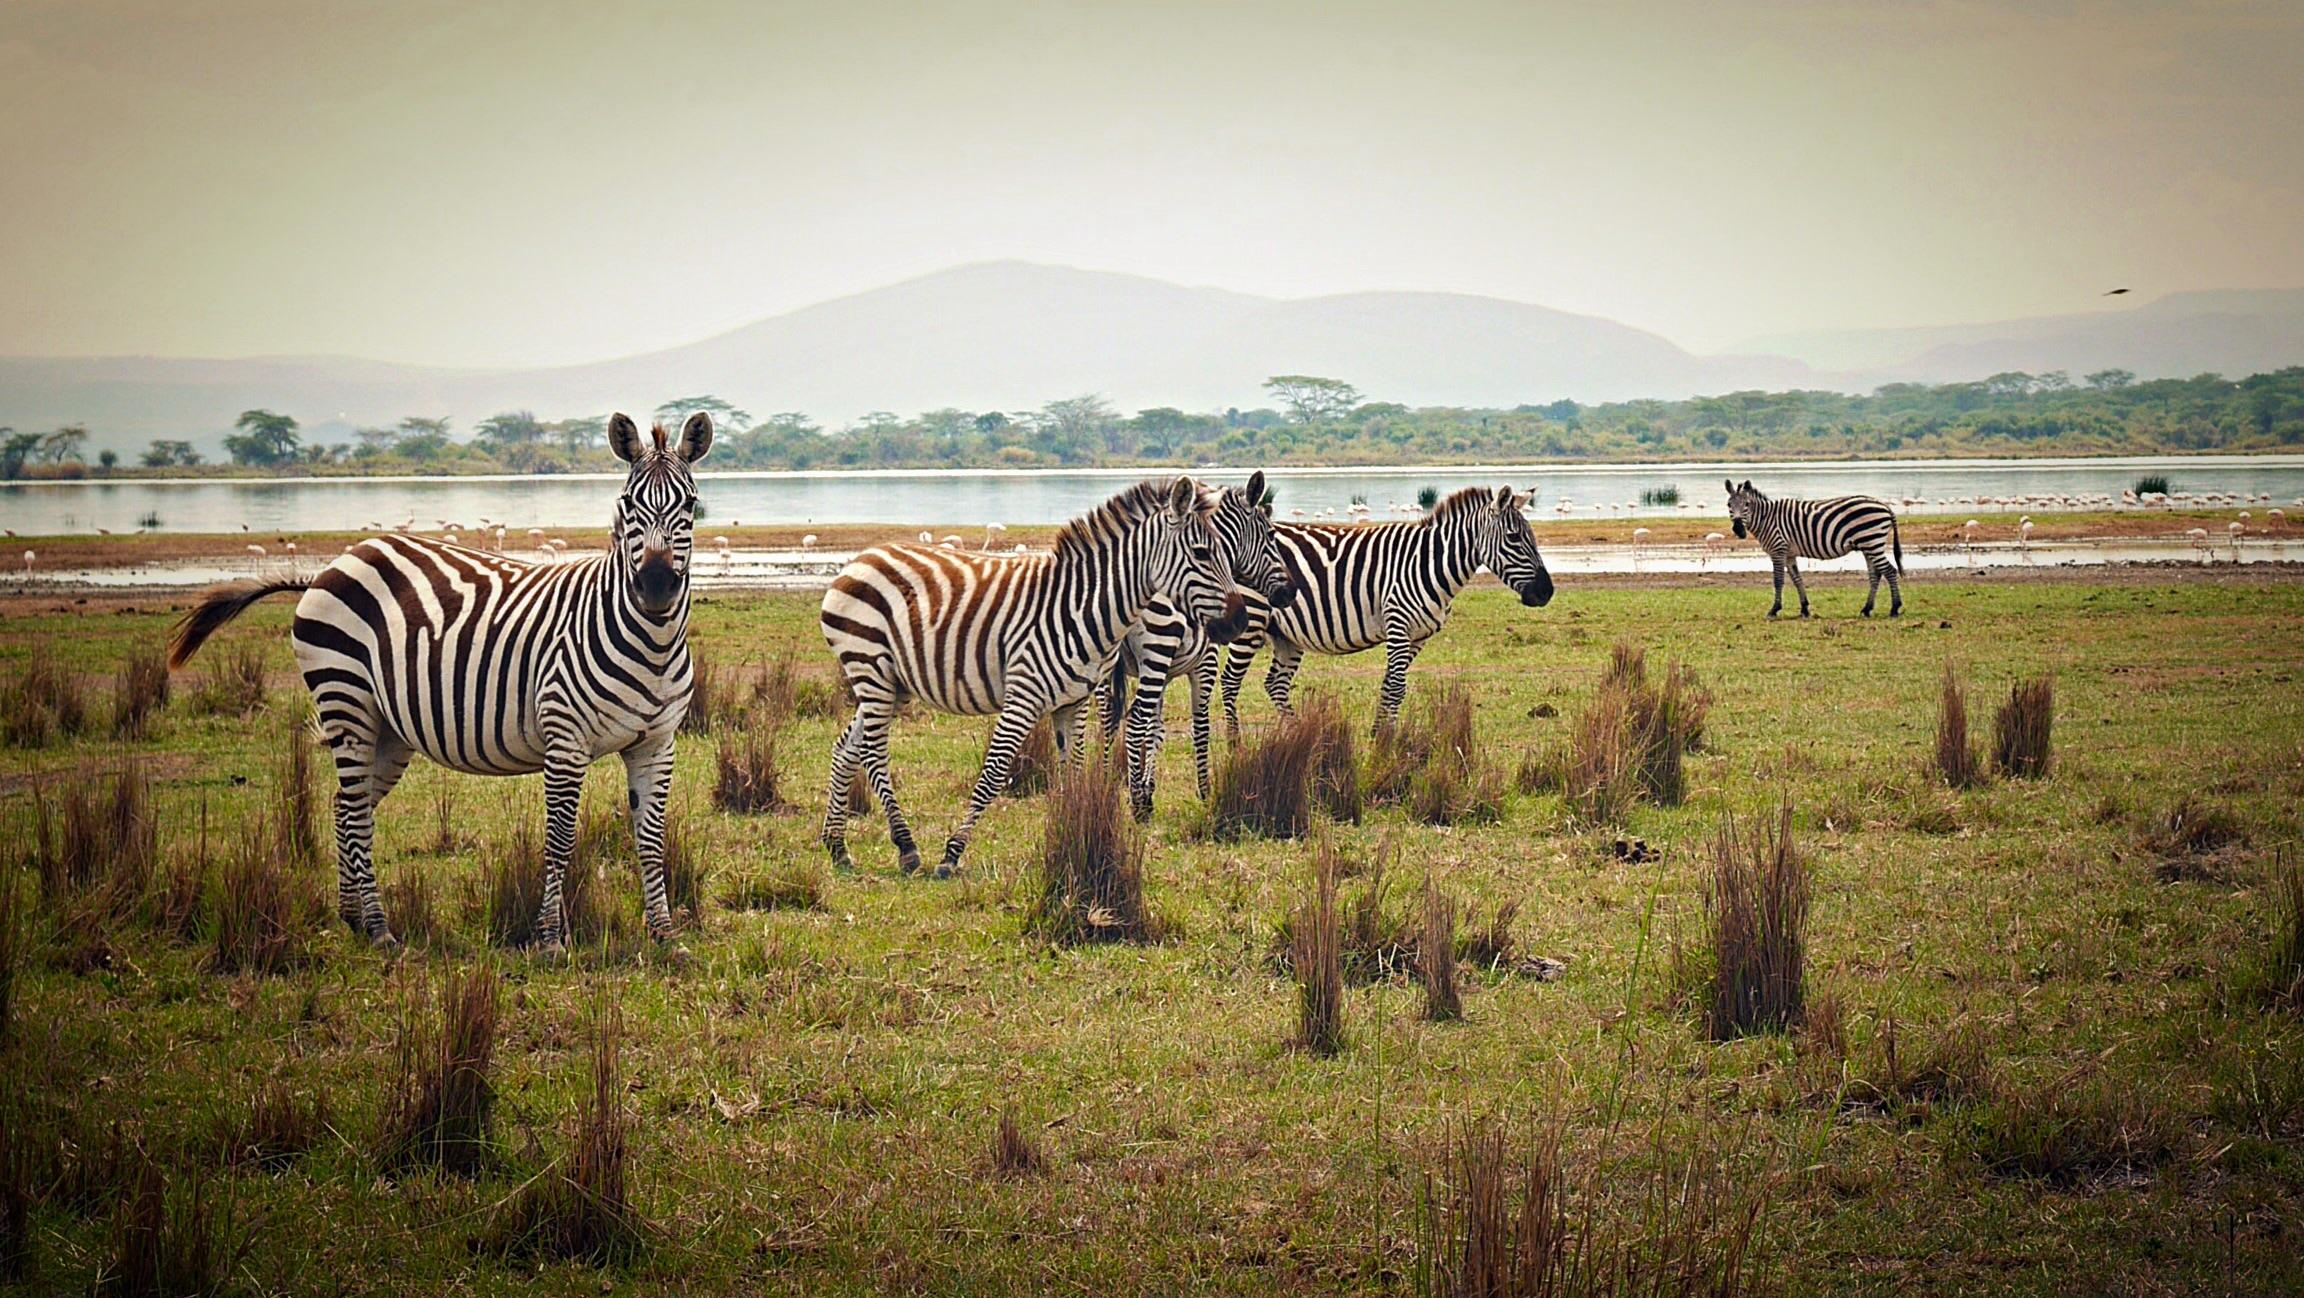 Zebras at Lake Elmenteita